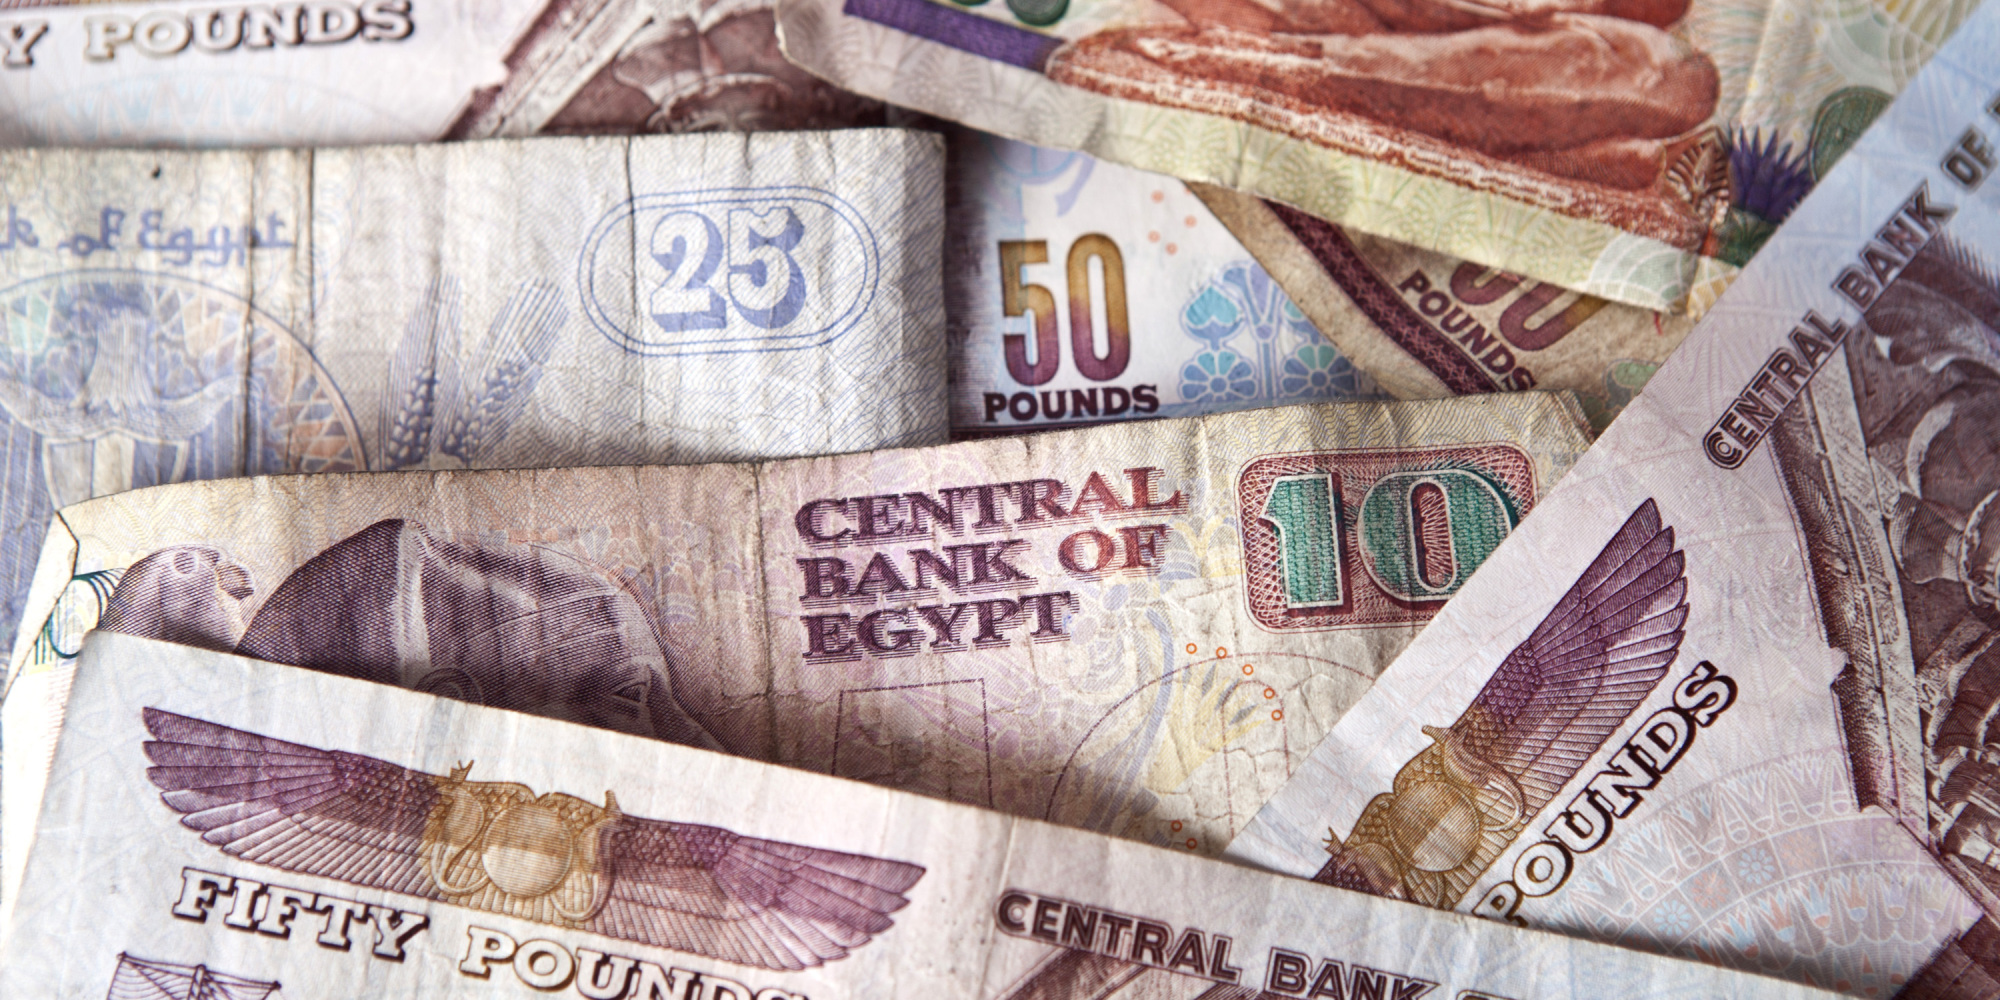 EGYPT IAN CURRENCY